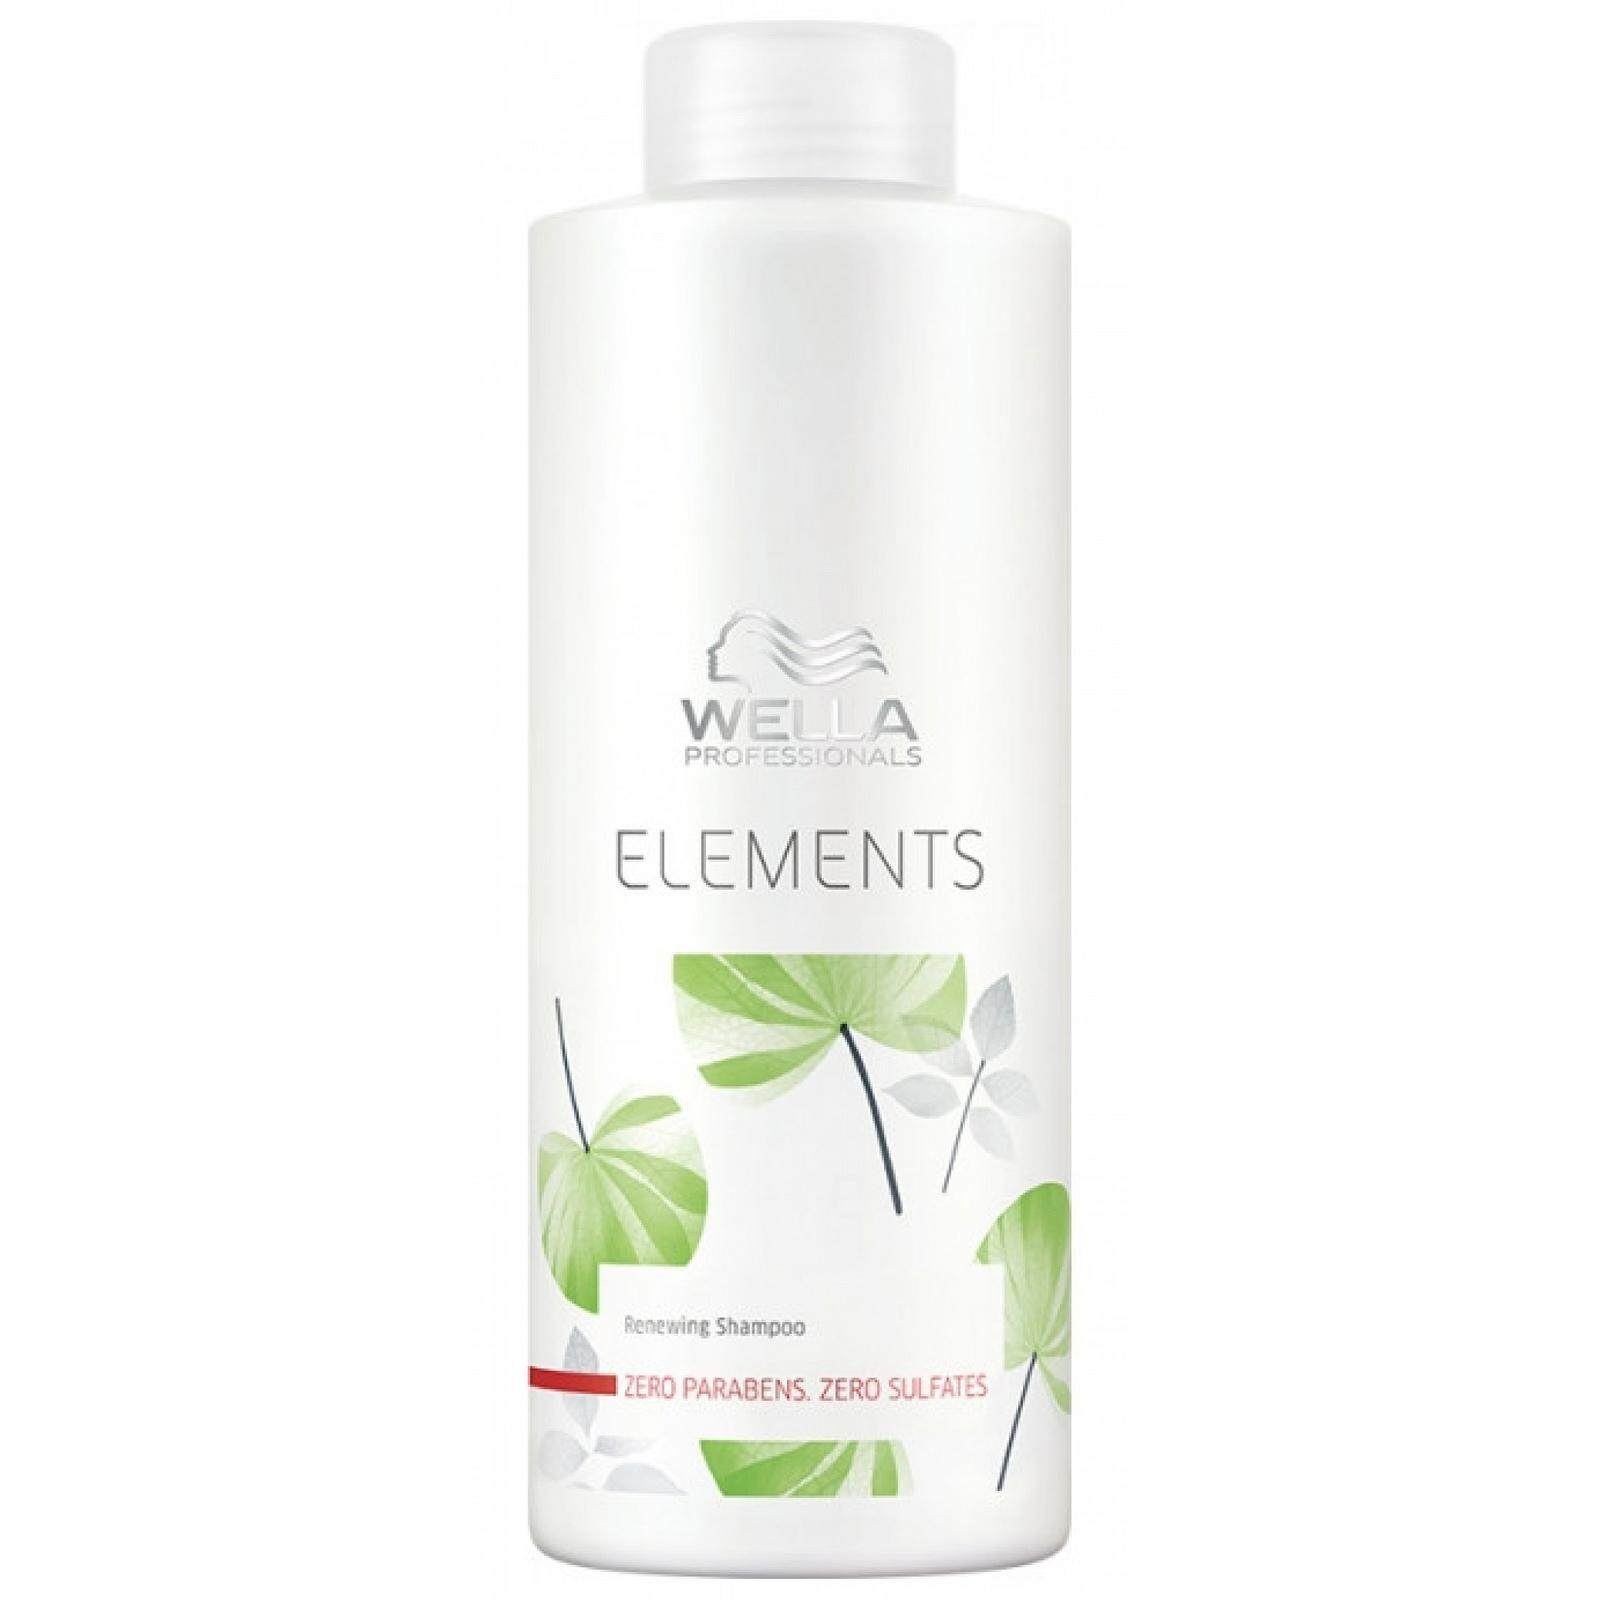 Wella Elements Lightweight Renewing value Set (Shampoo 1000ML+Conditioner 1000ML+Mask 500ML)